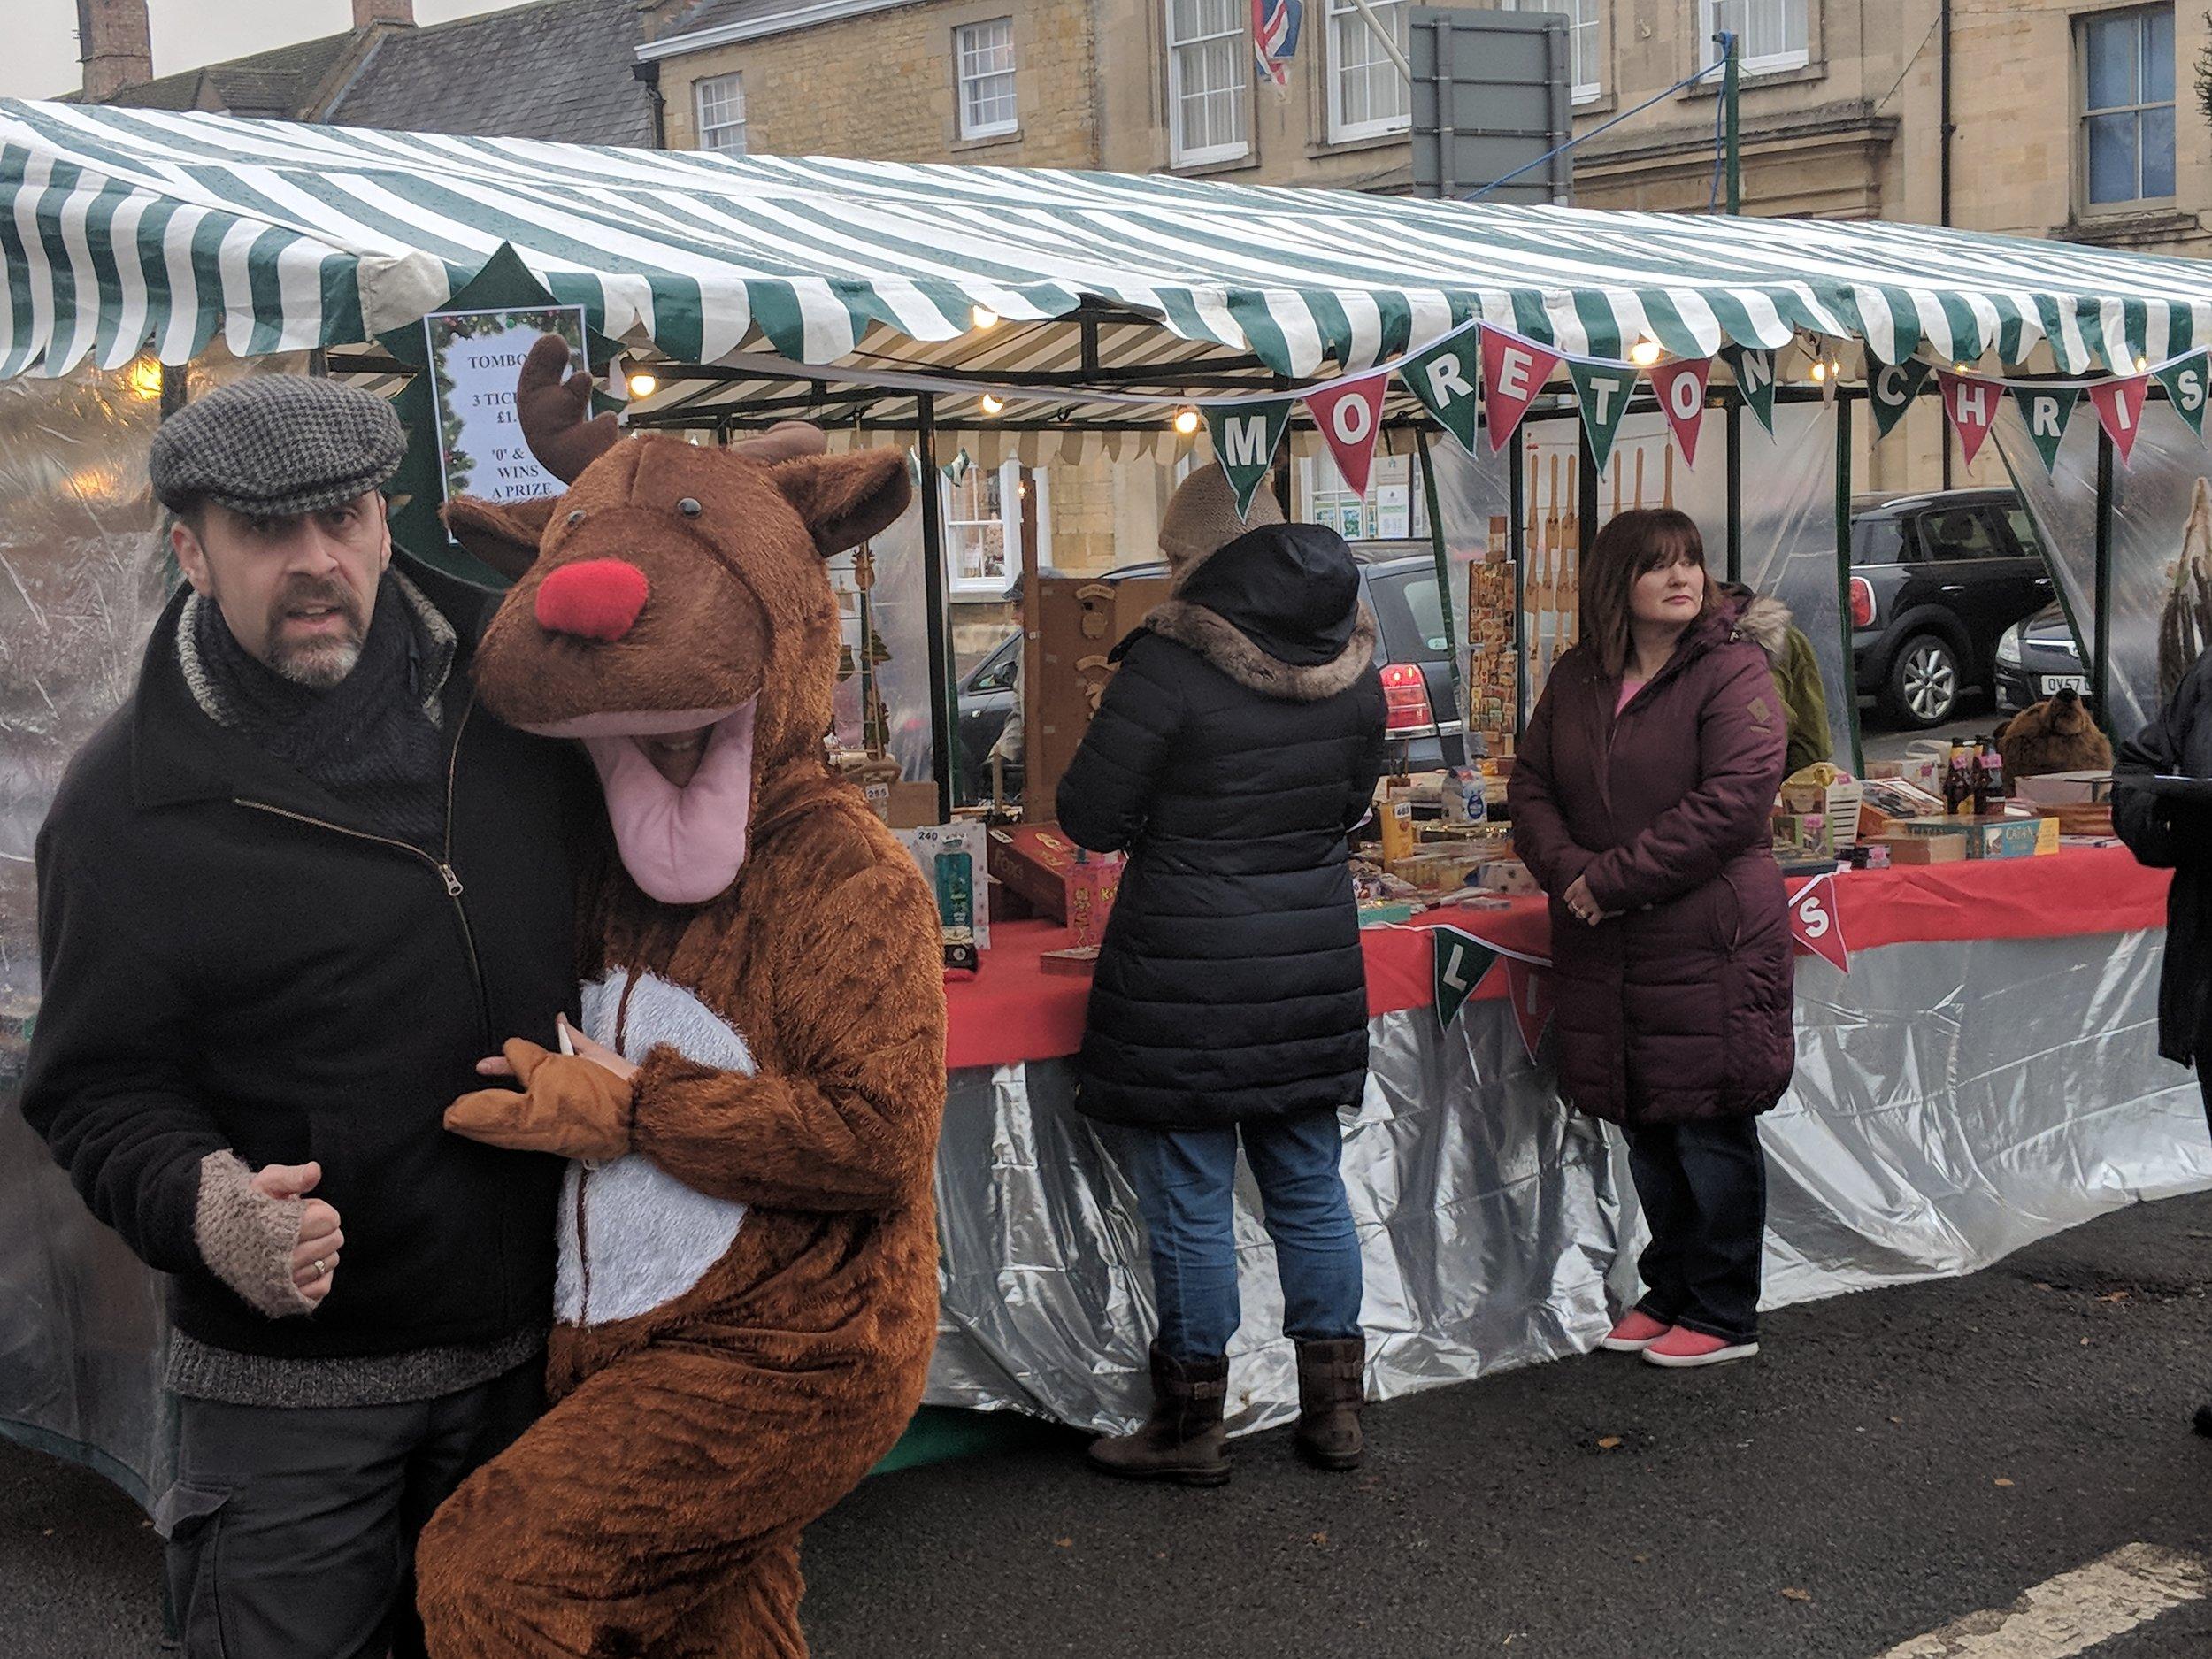 Christmas Market antics